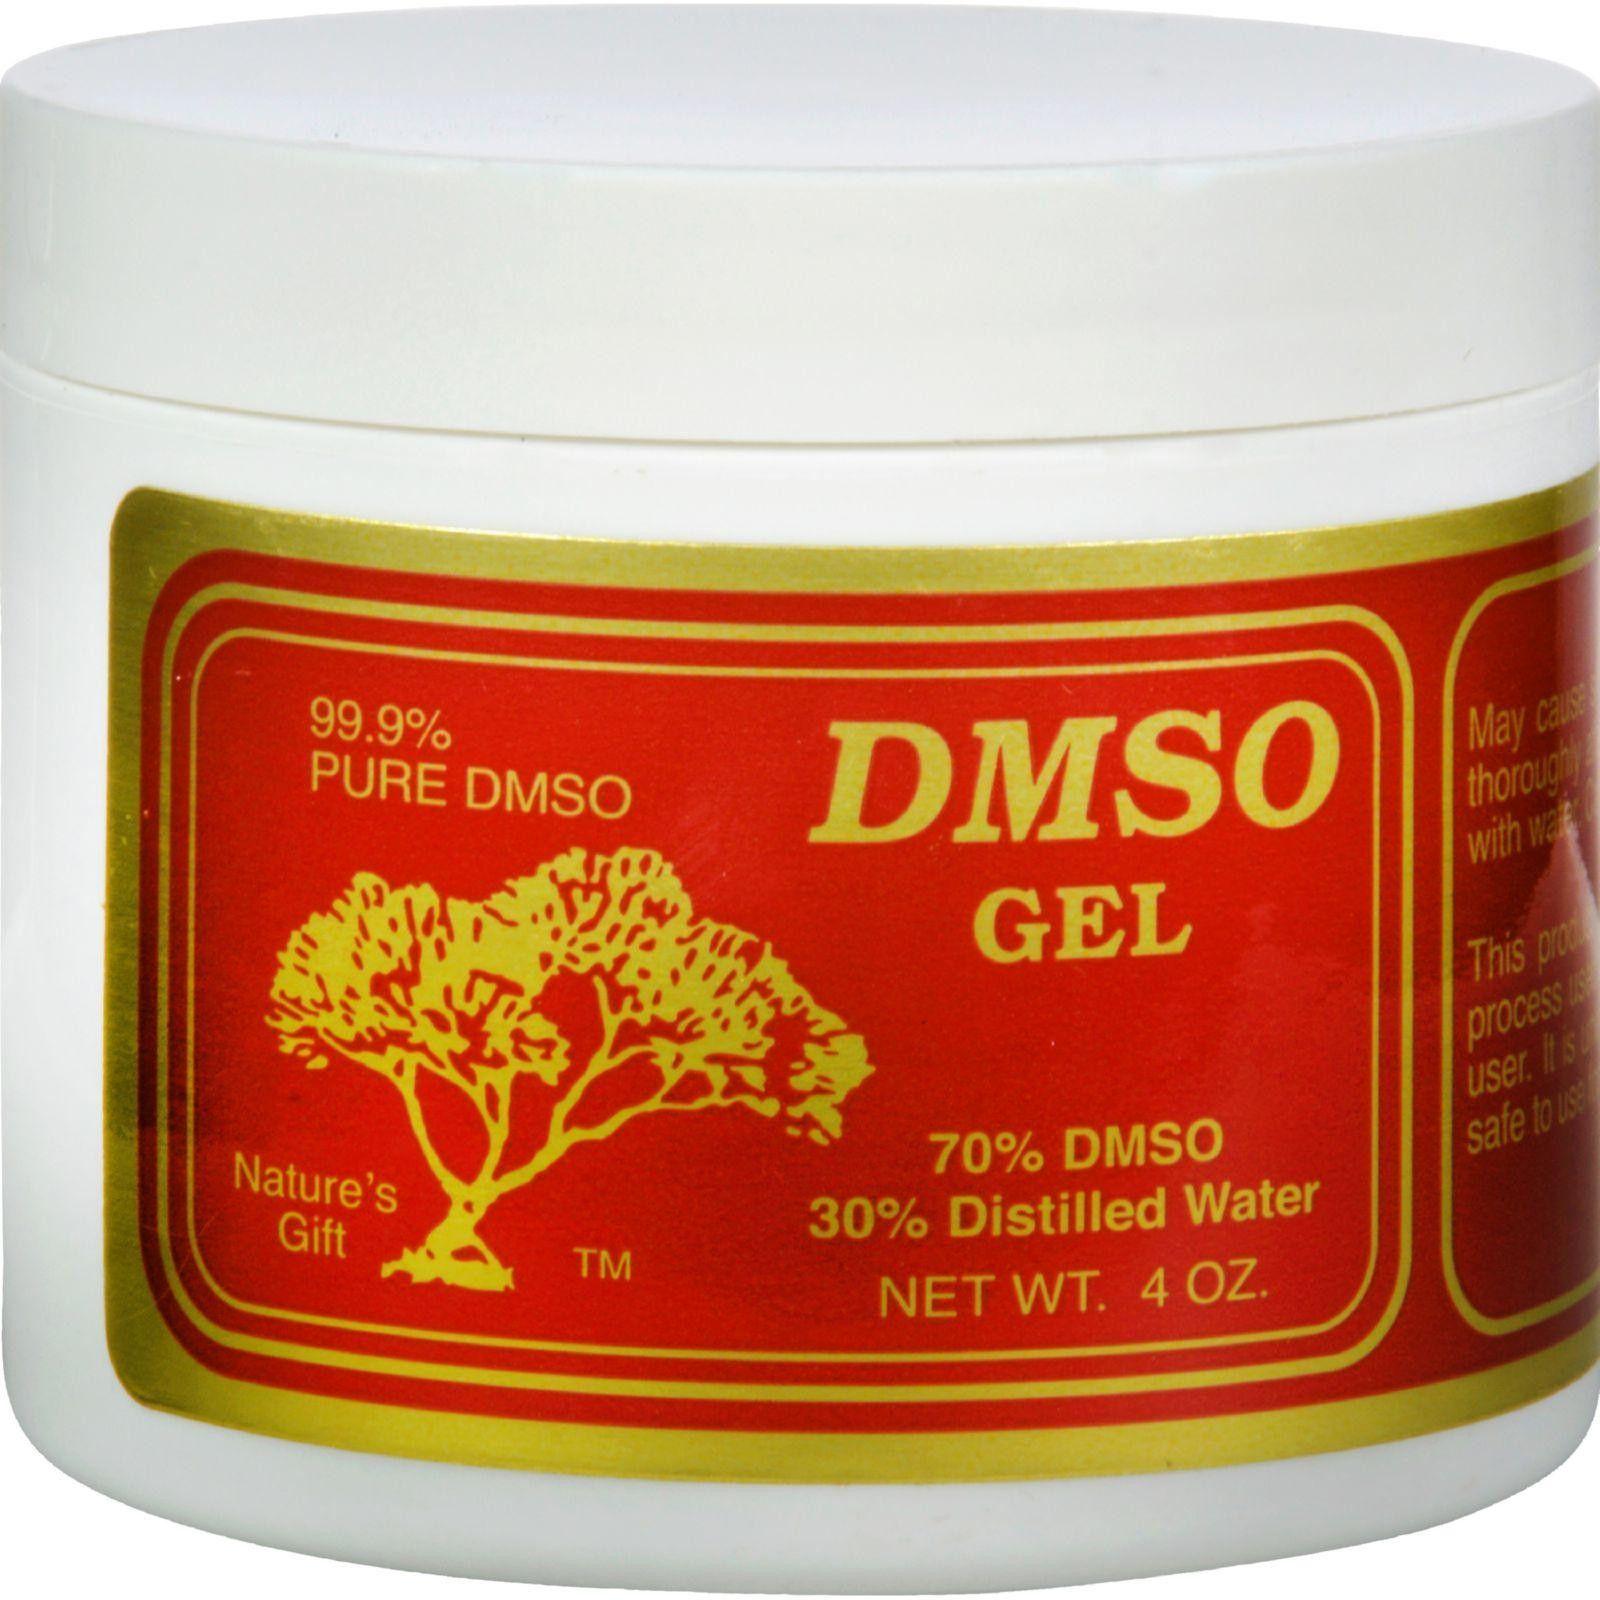 Dmso Gel 70 30 Unfragranced 4 Oz Natural Gifts Rose Scented Products Gel